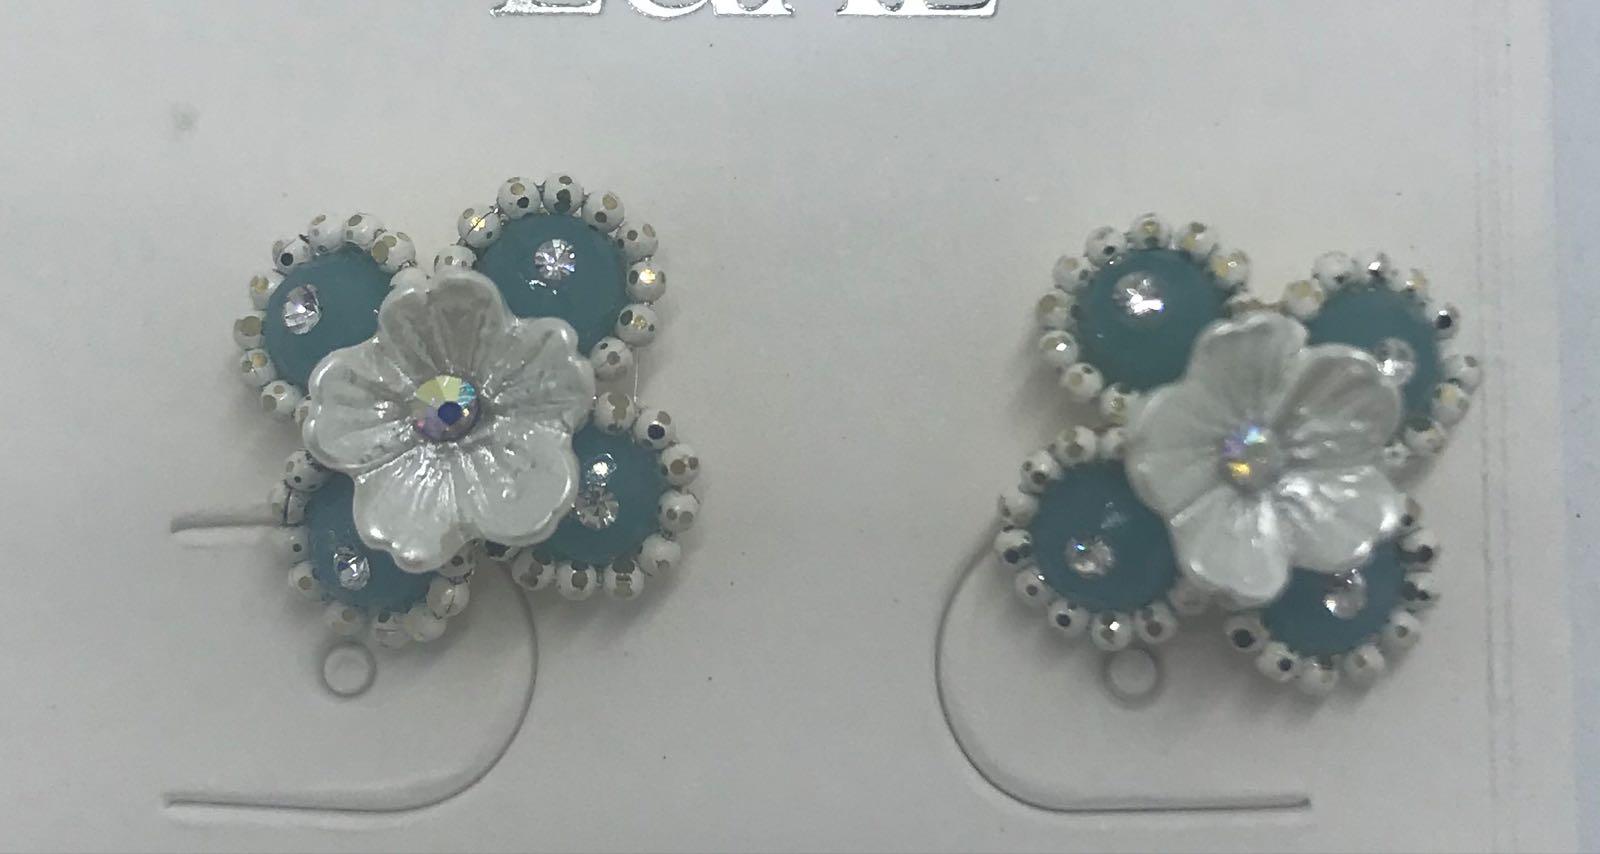 Life Charms flower stud earrings